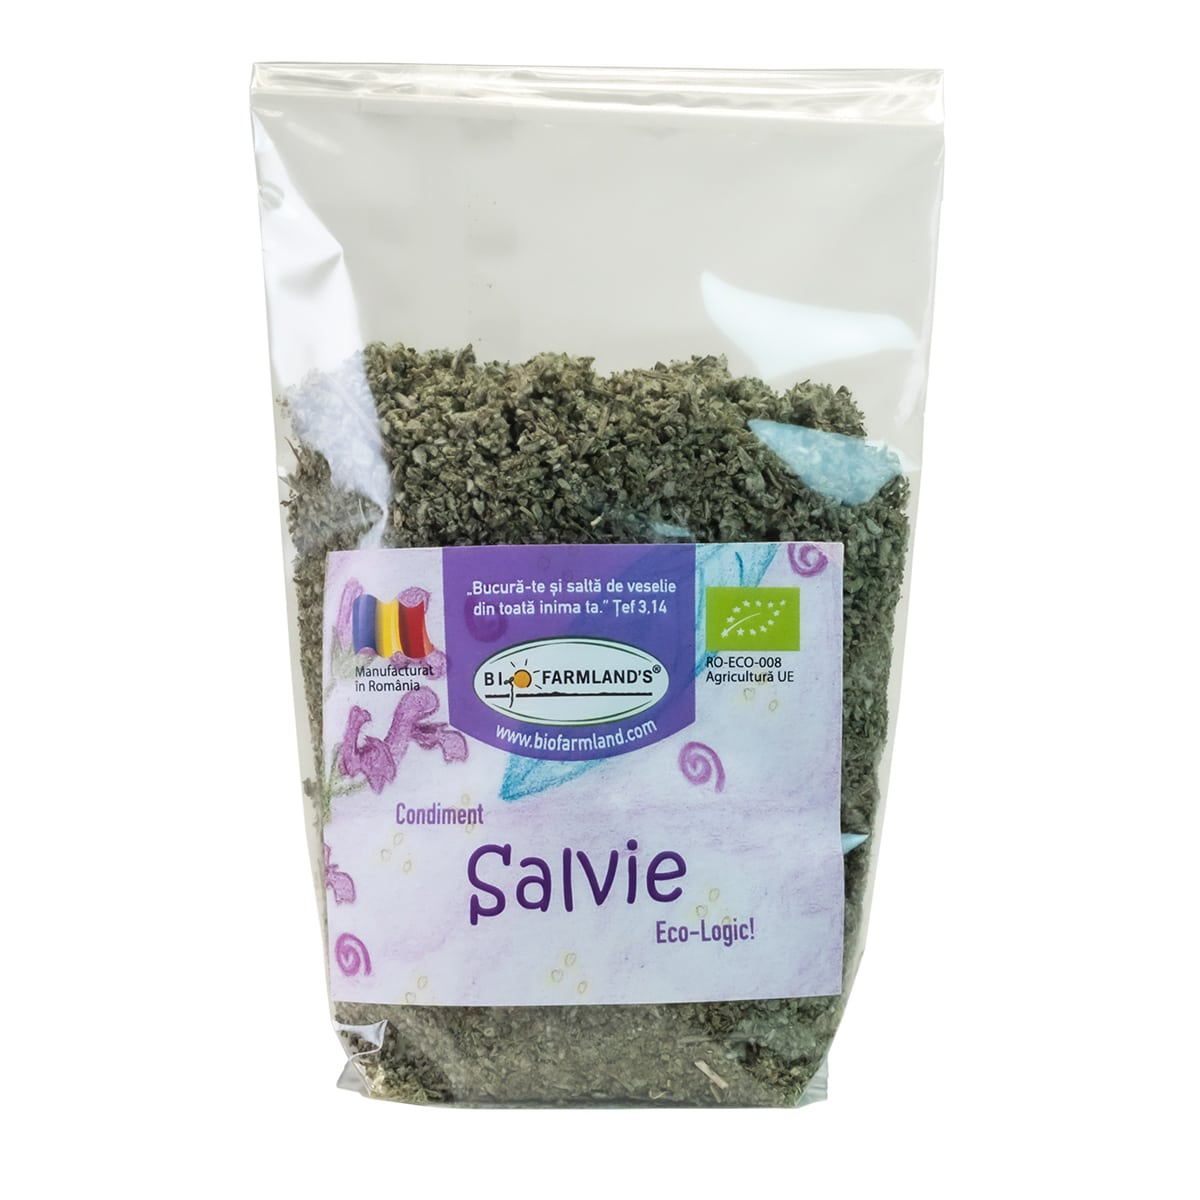 Condiment Salvie refill